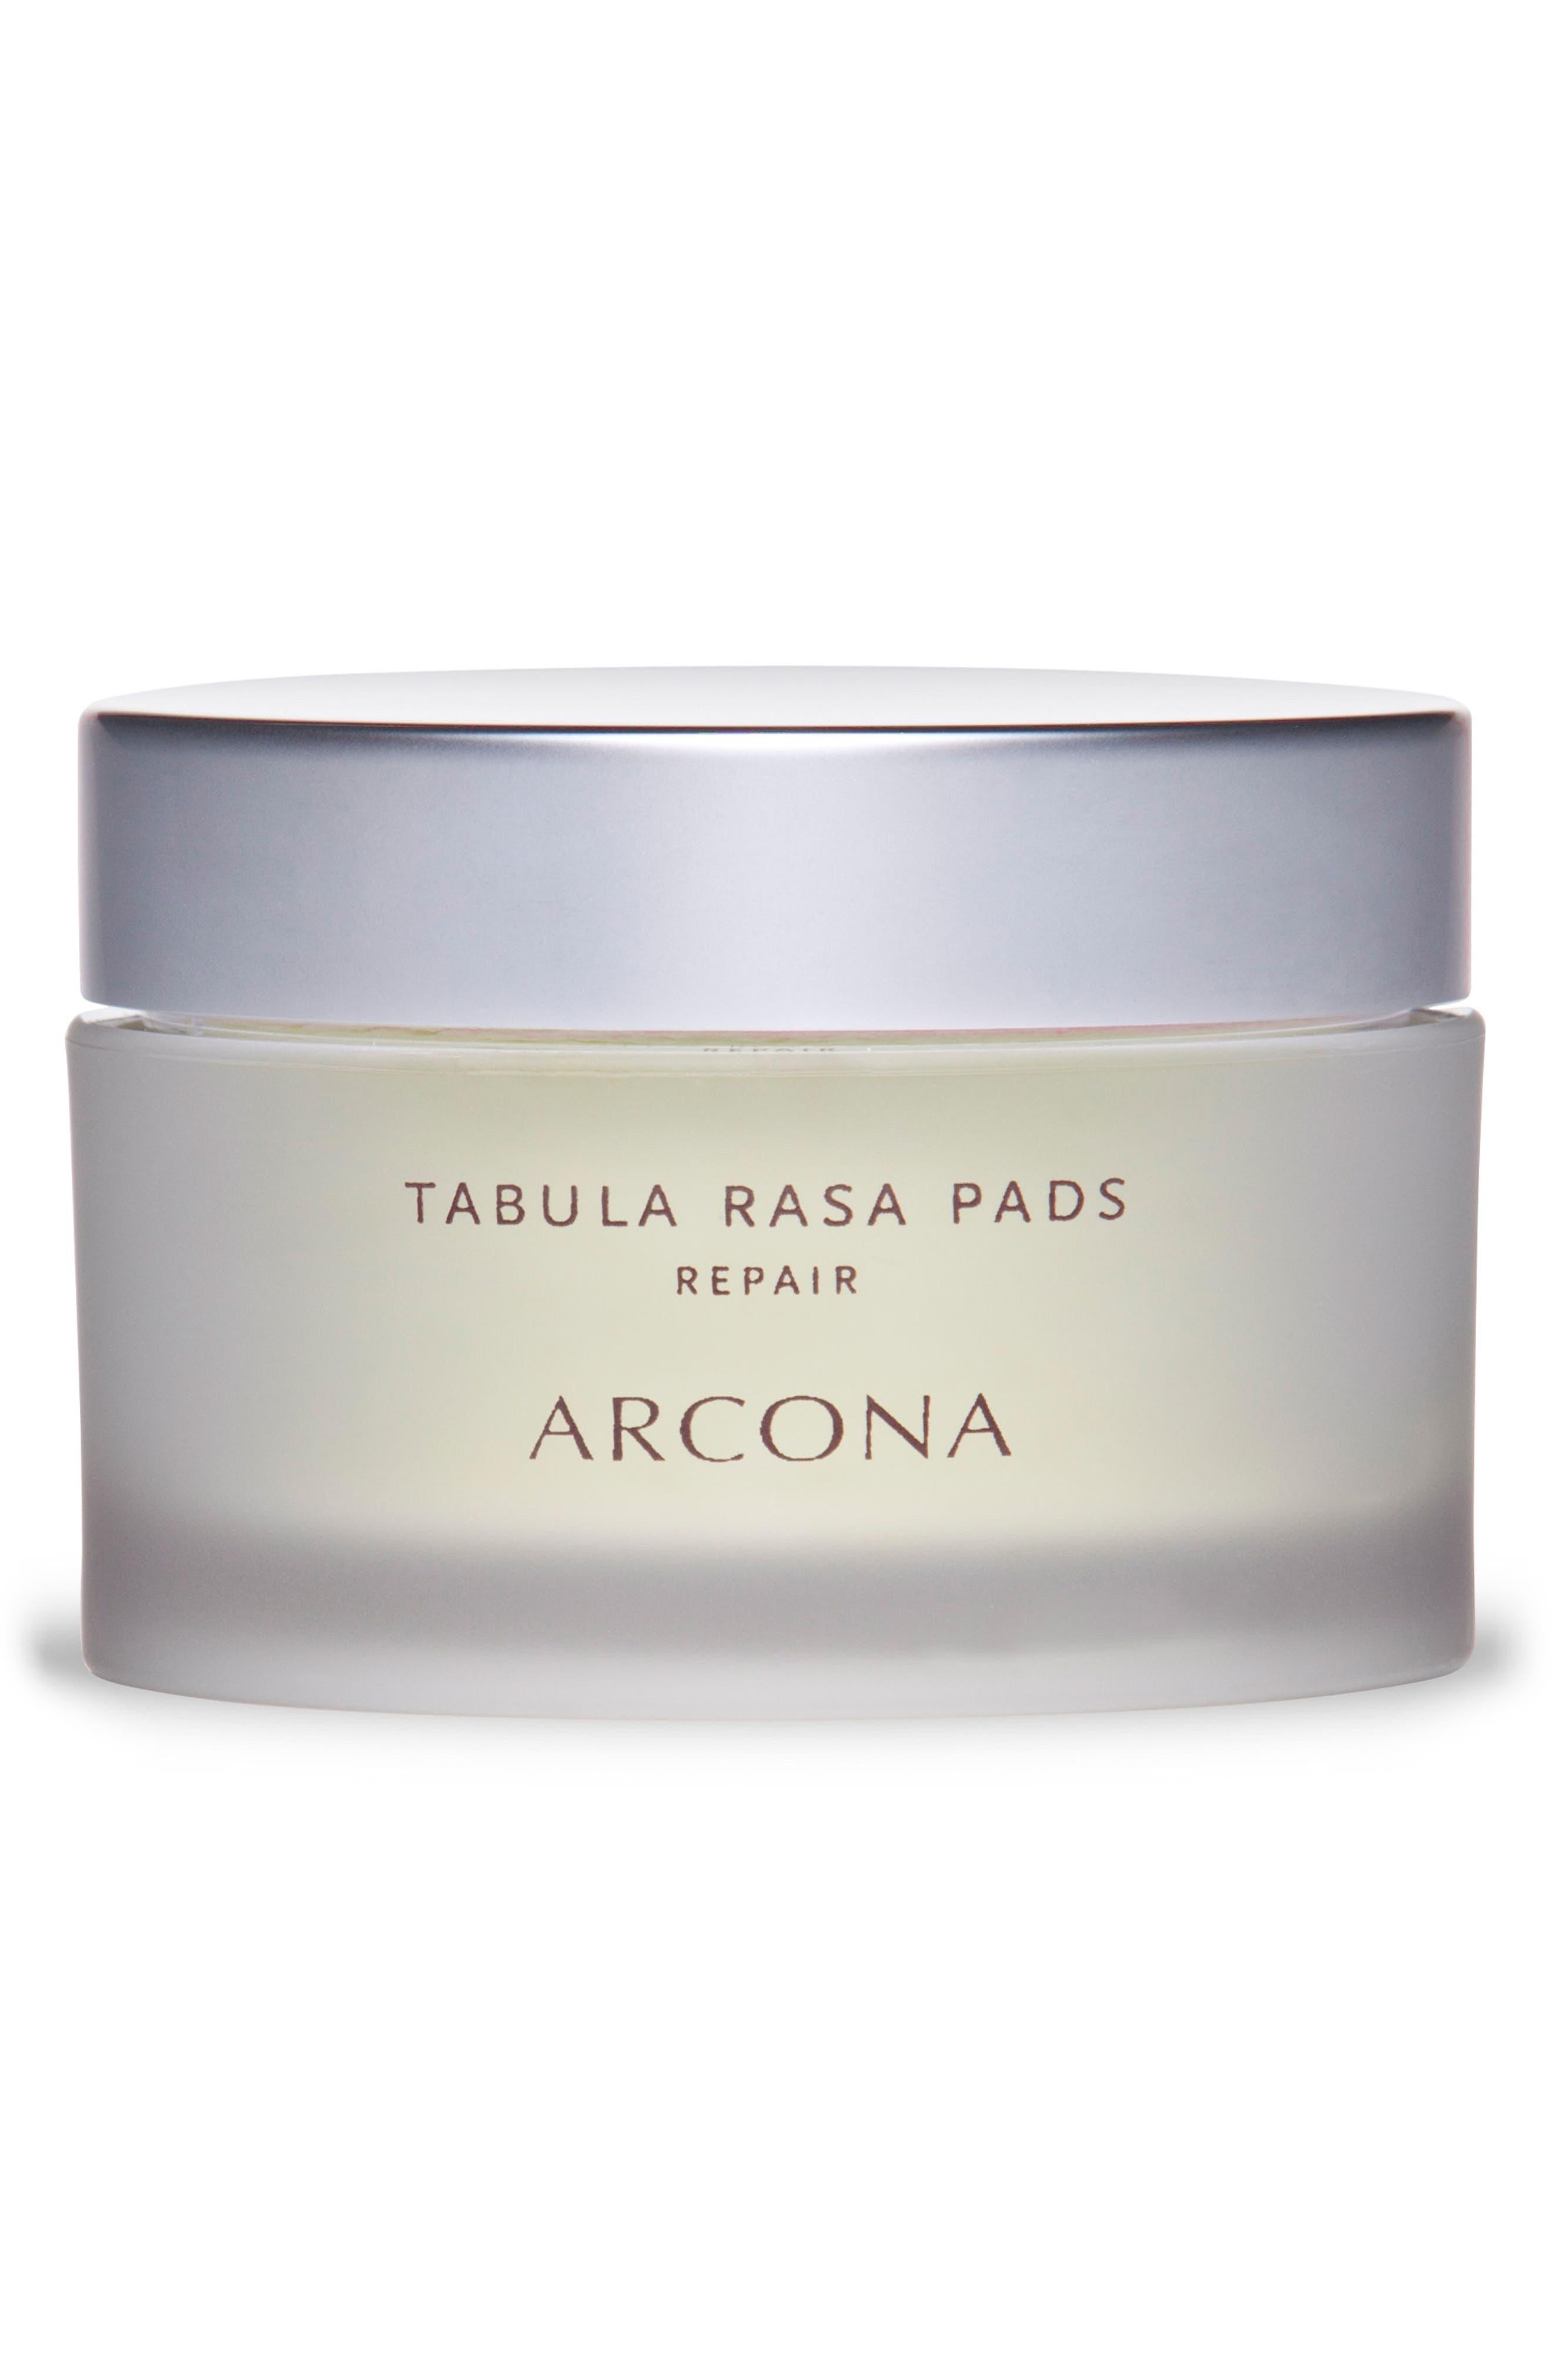 Alternate Image 1 Selected - ARCONA Tabula Rasa Pads